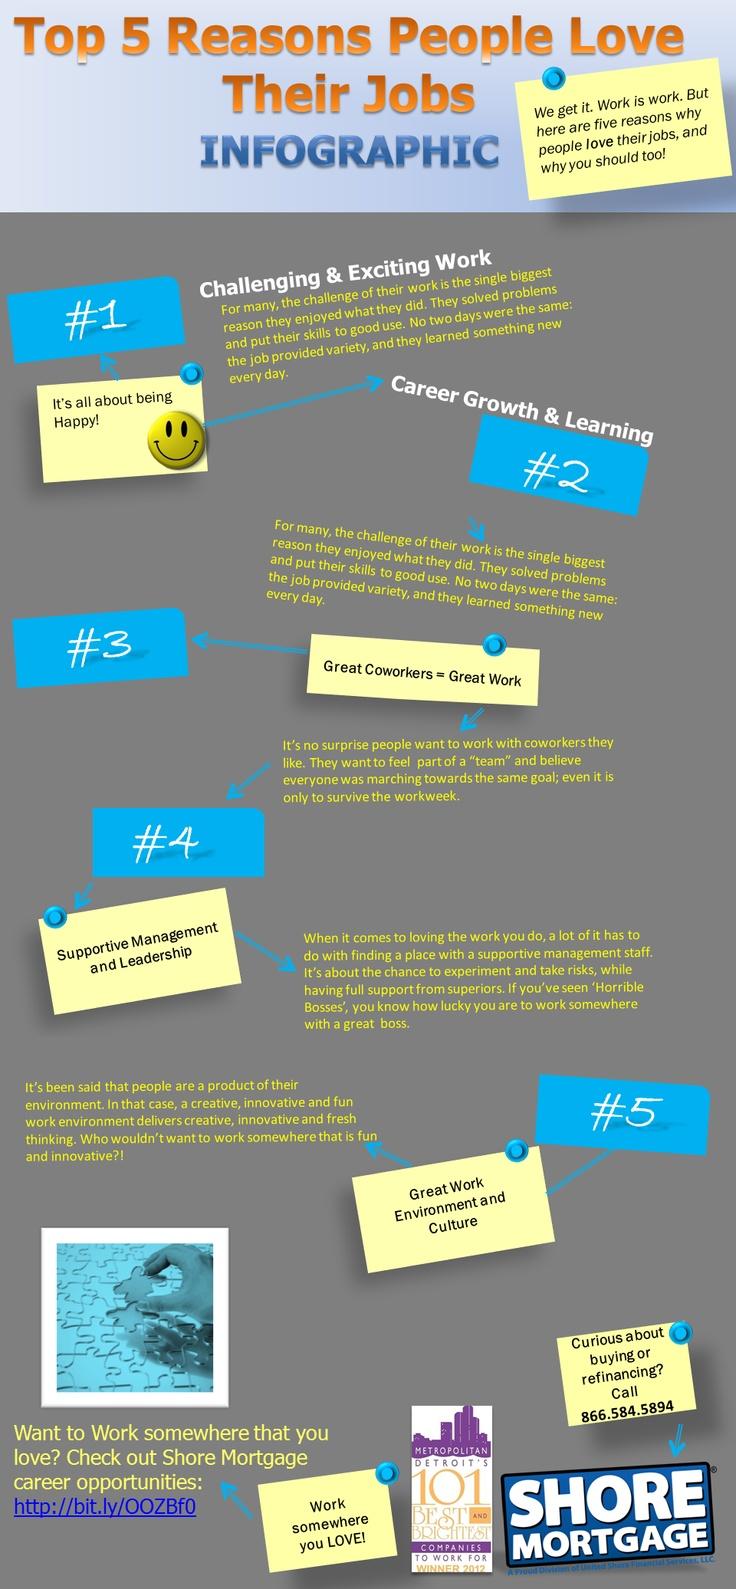 Job Infographics: Top 5 reasons people love their jobs. #careers